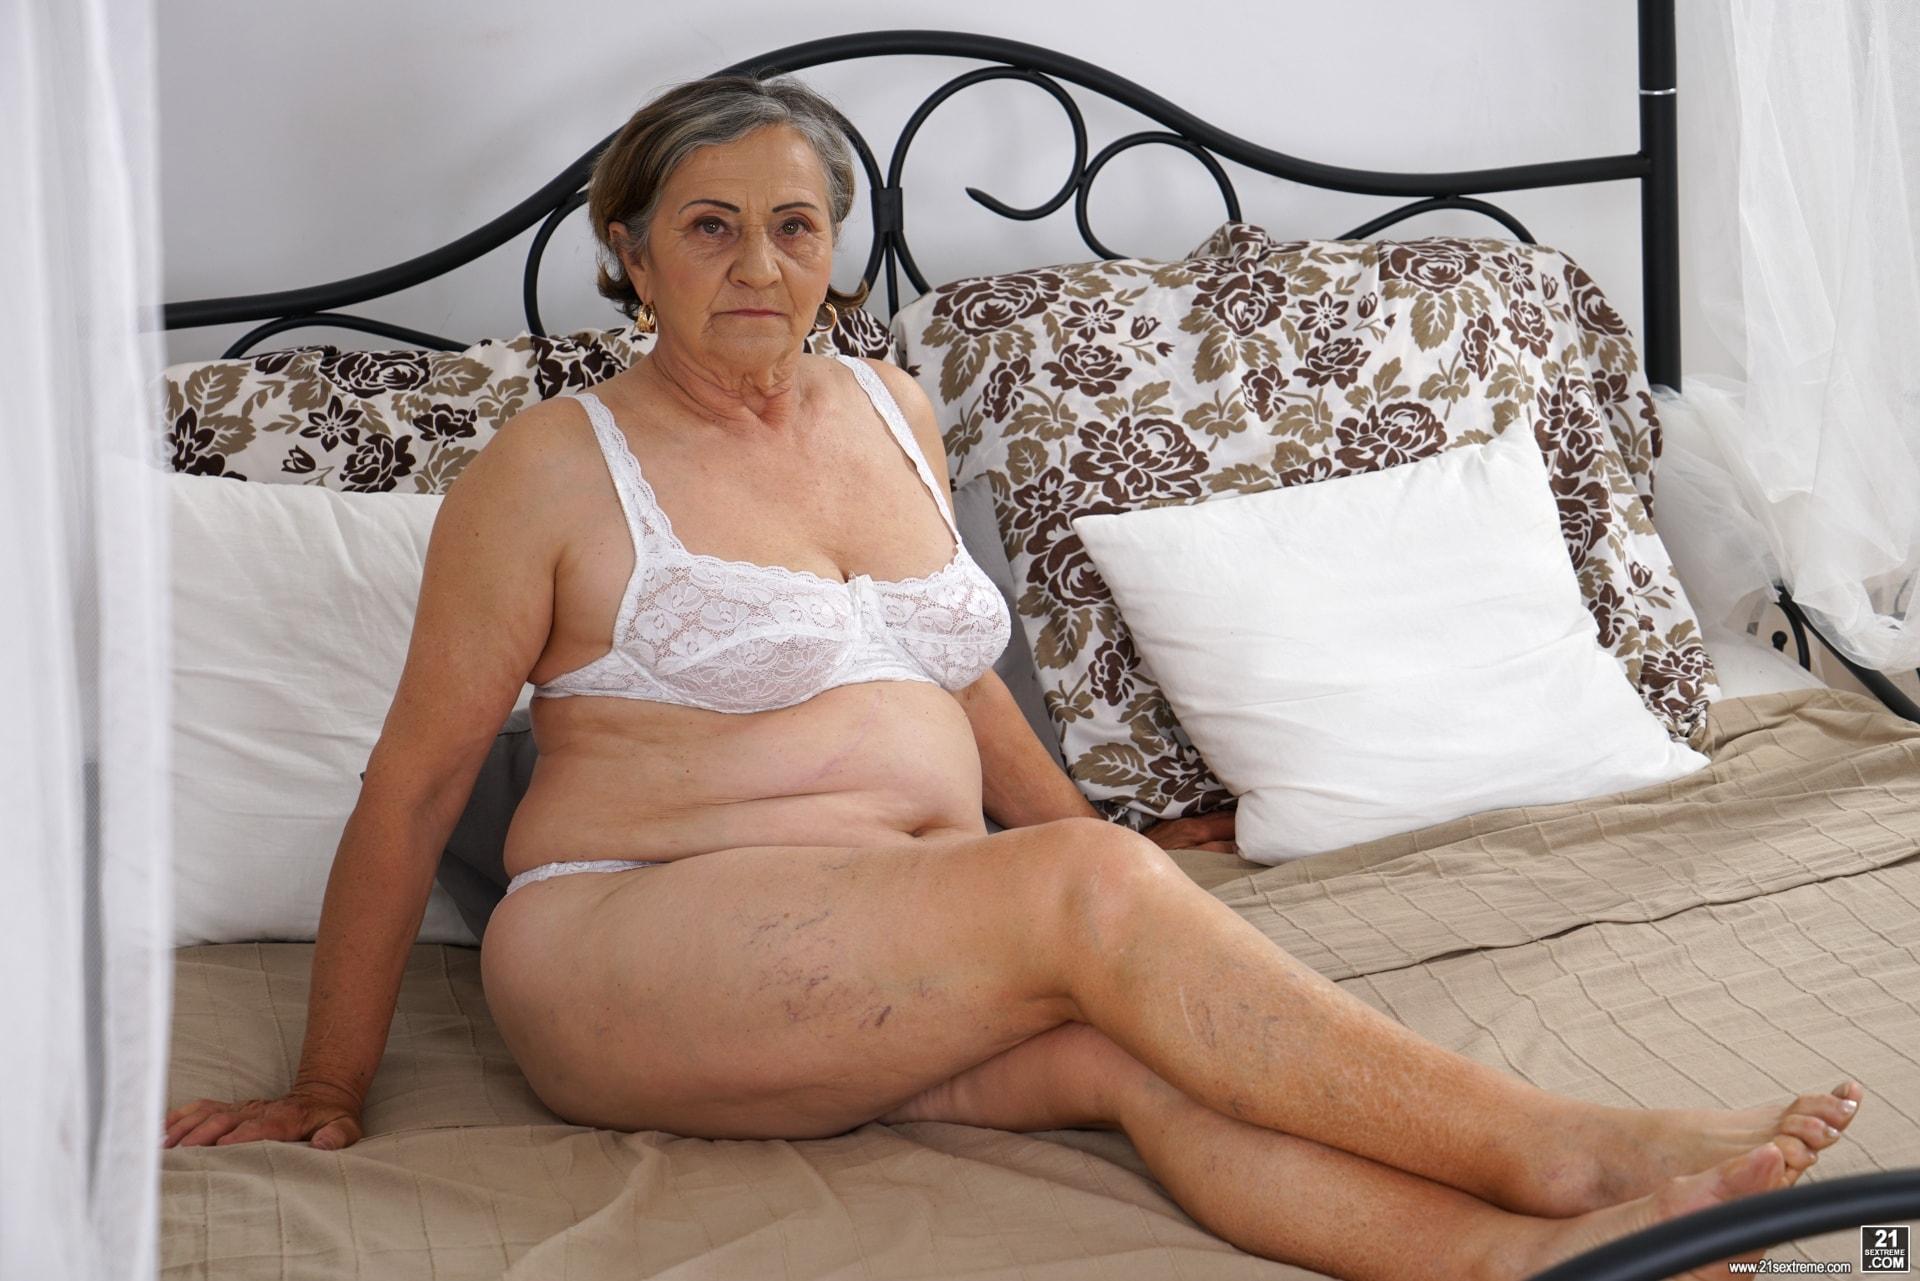 sex vidoes kåta gamla kvinnor